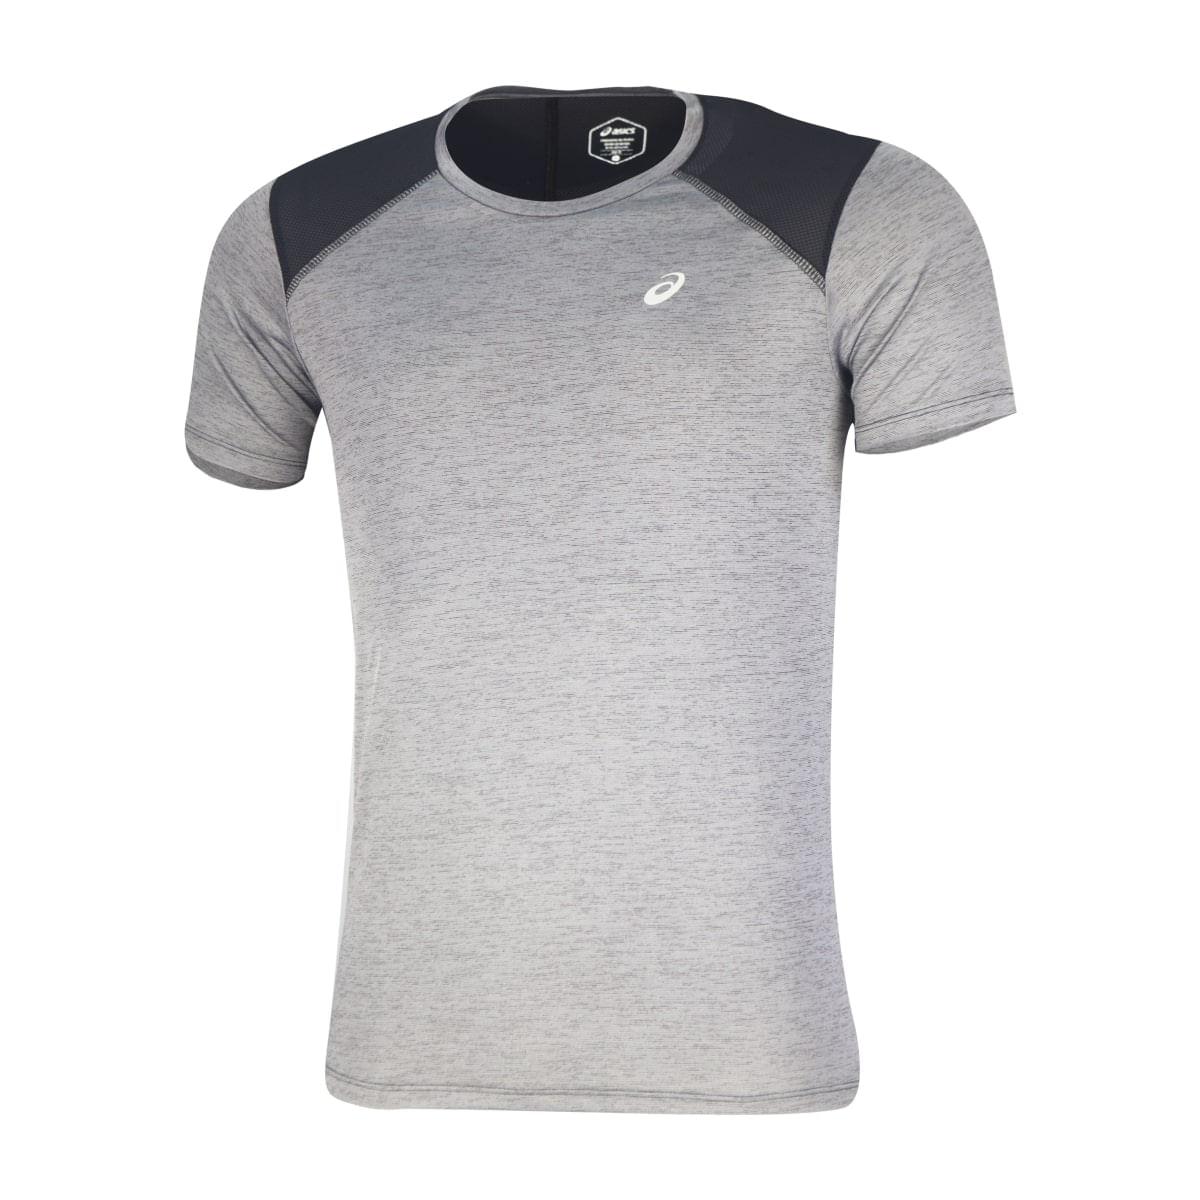 Camiseta-Asics-Running-Blend----Masculina---Cinza